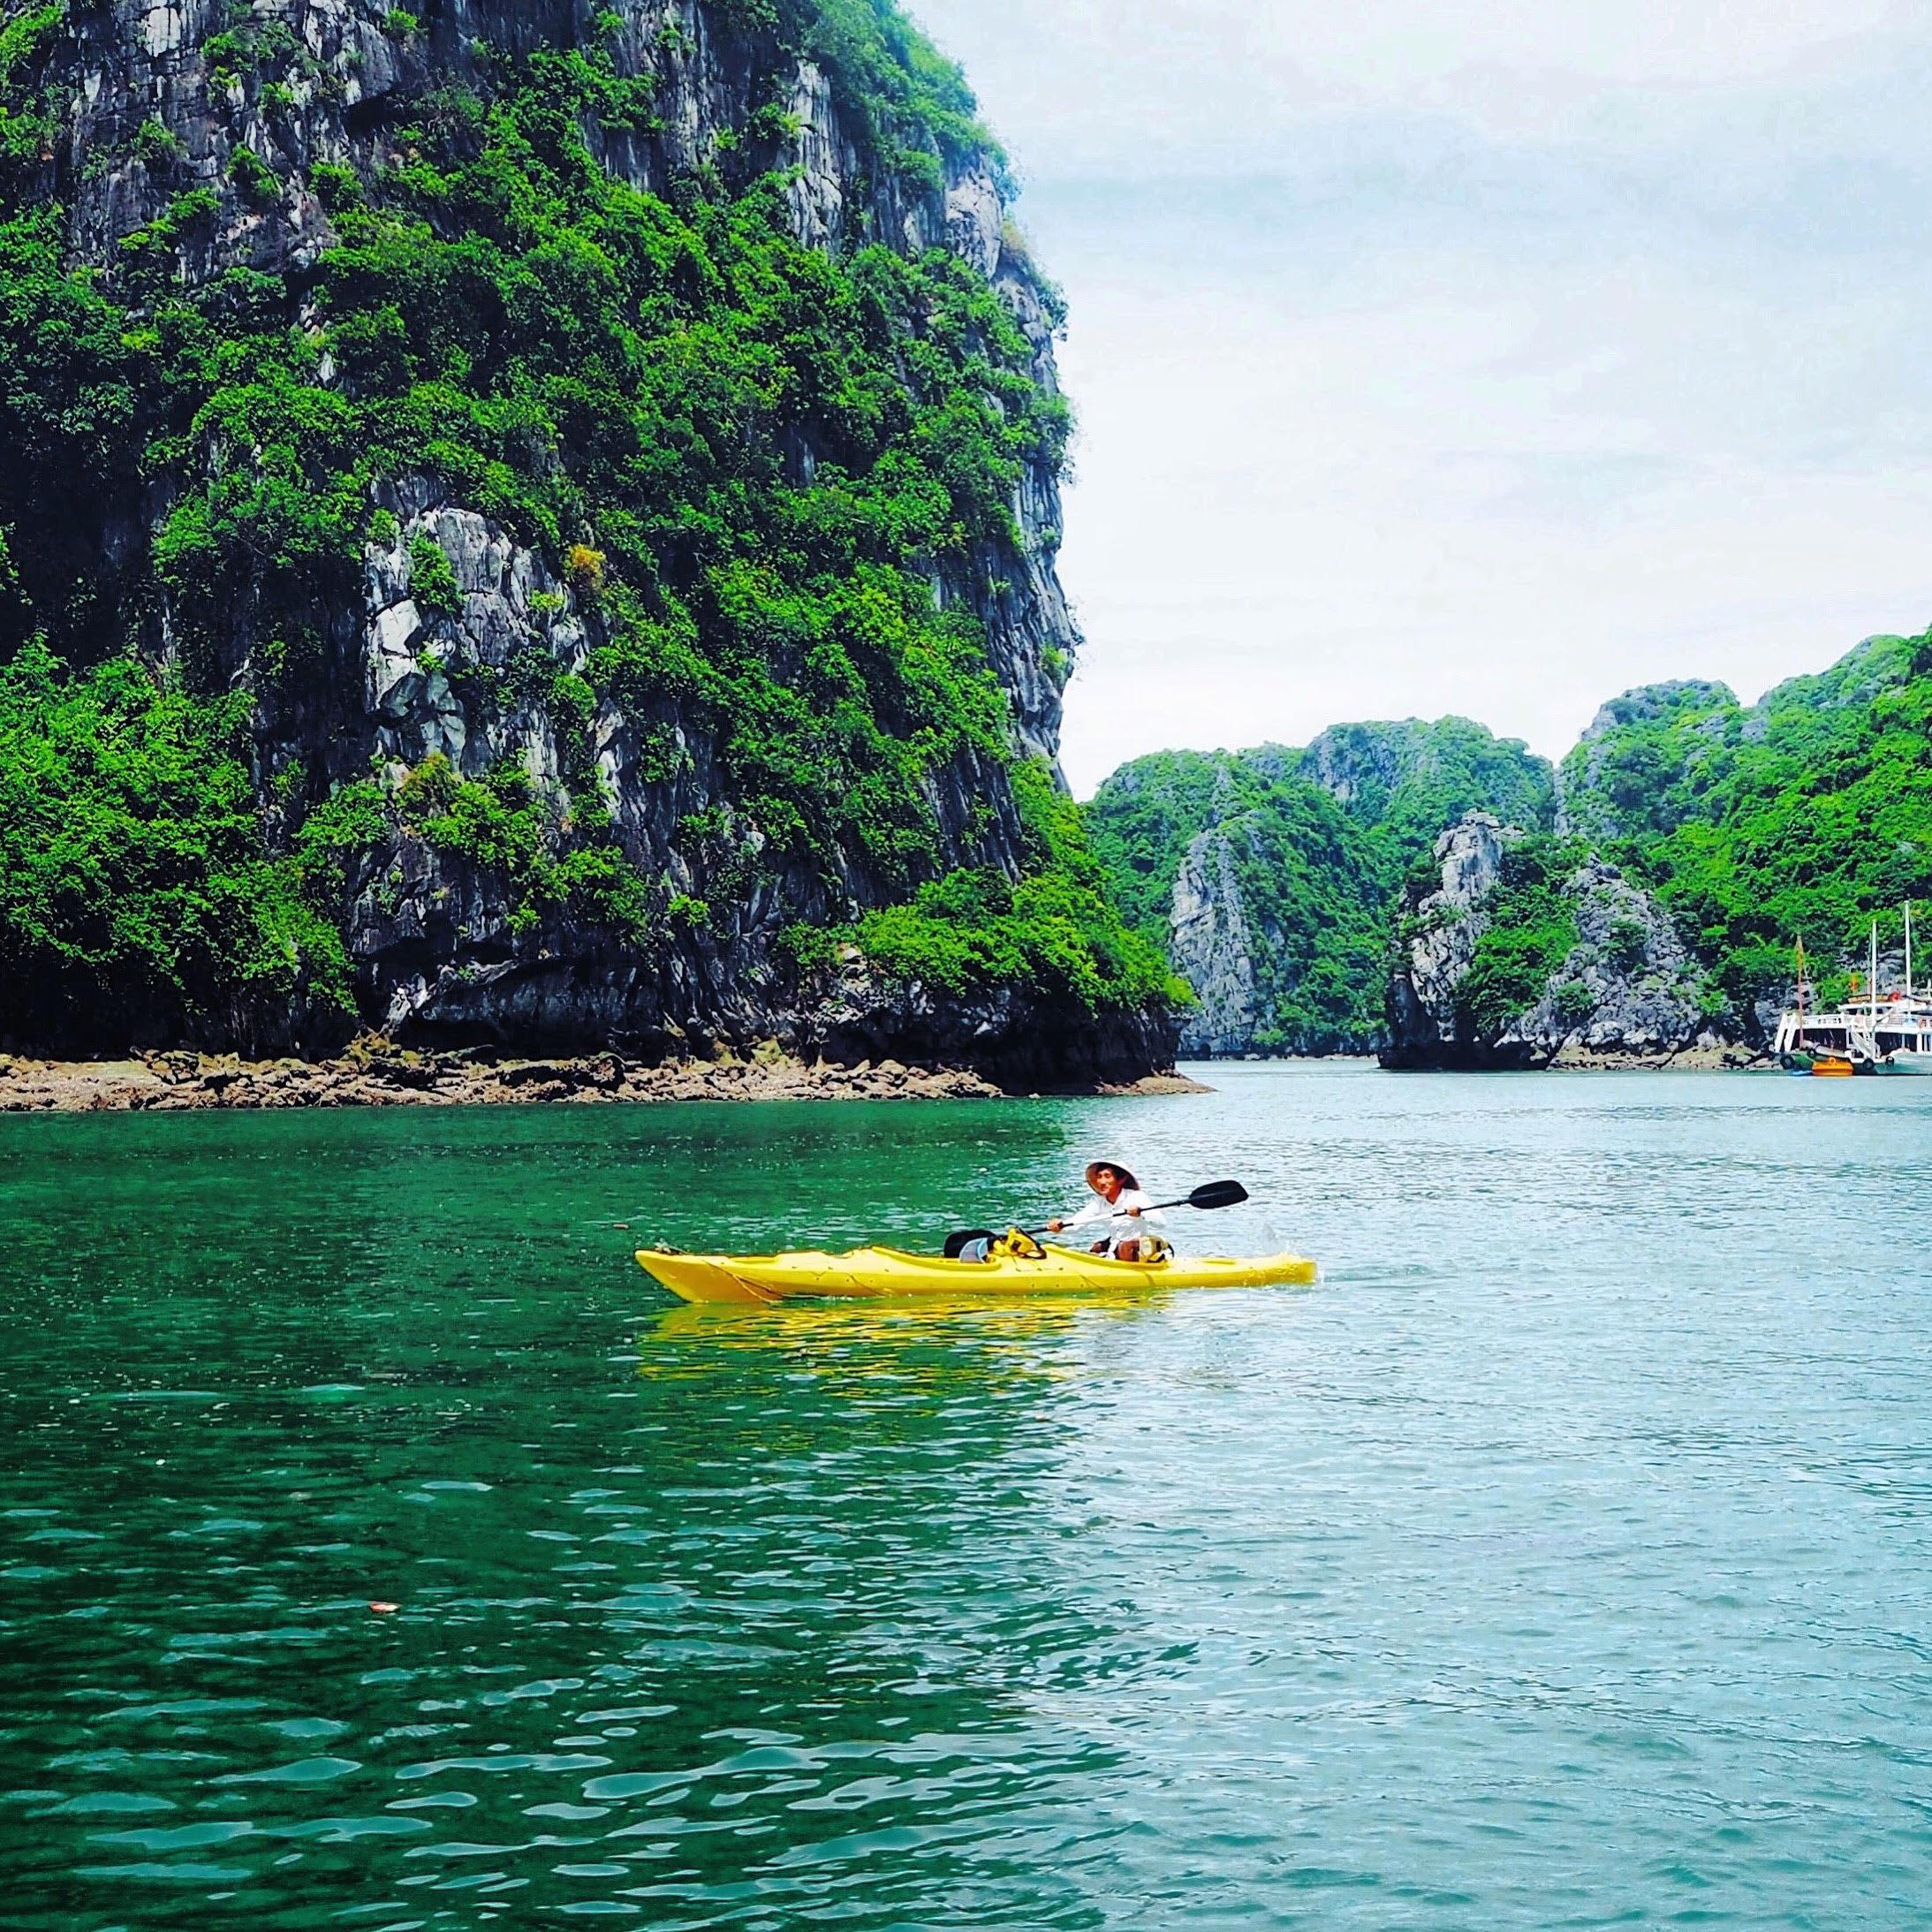 Lokale i kajak i Halong Bay